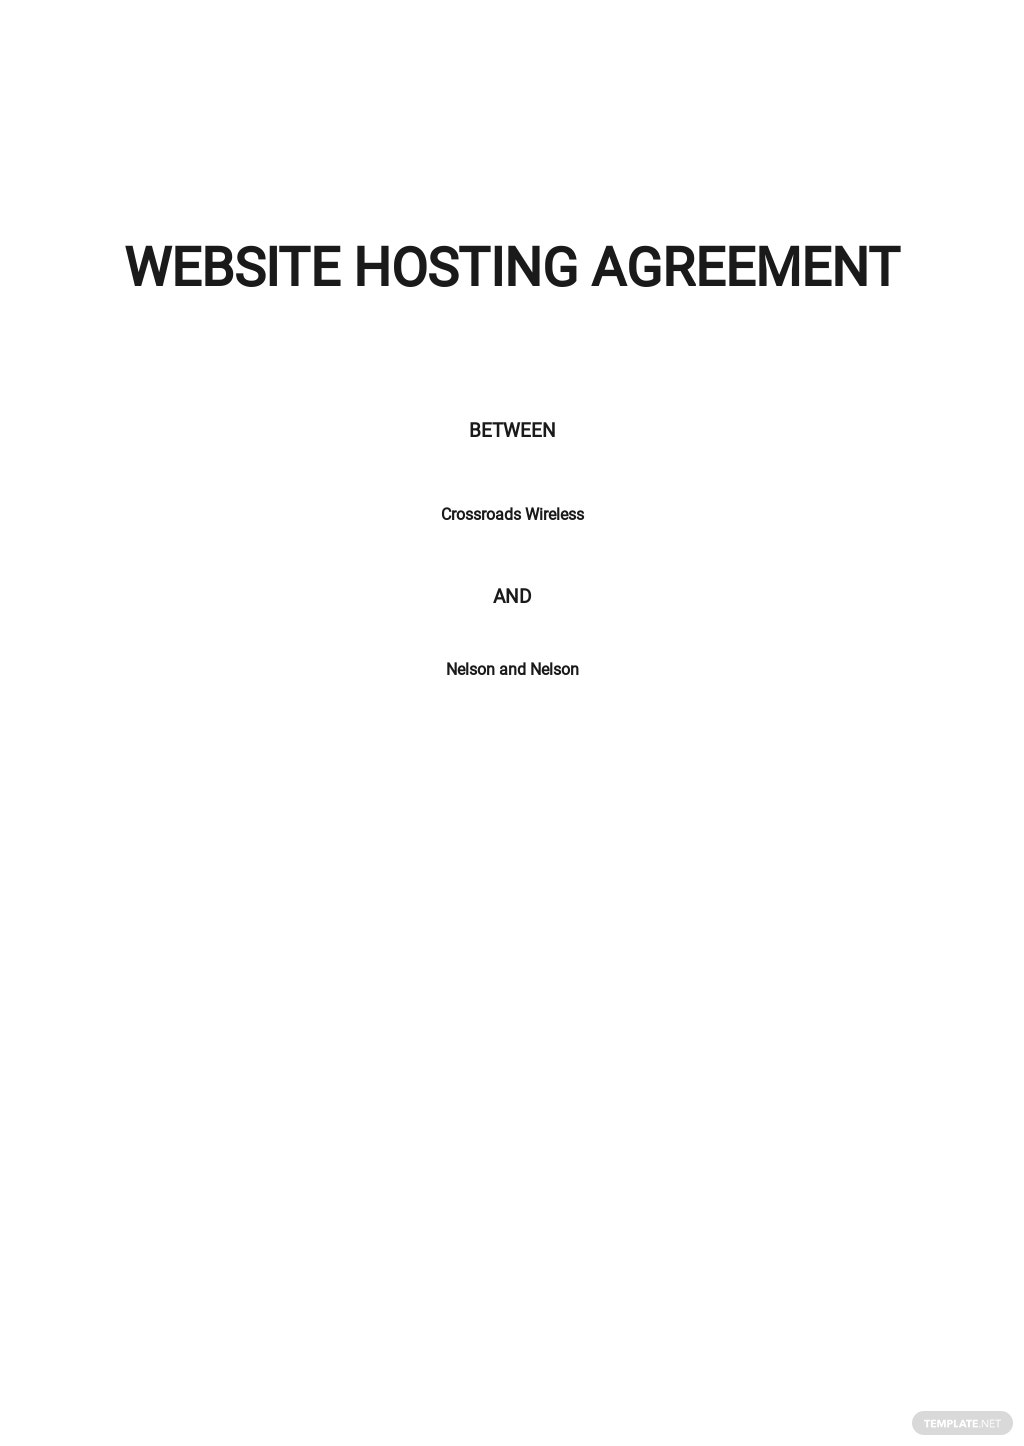 Website Hosting Agreement Template.jpe